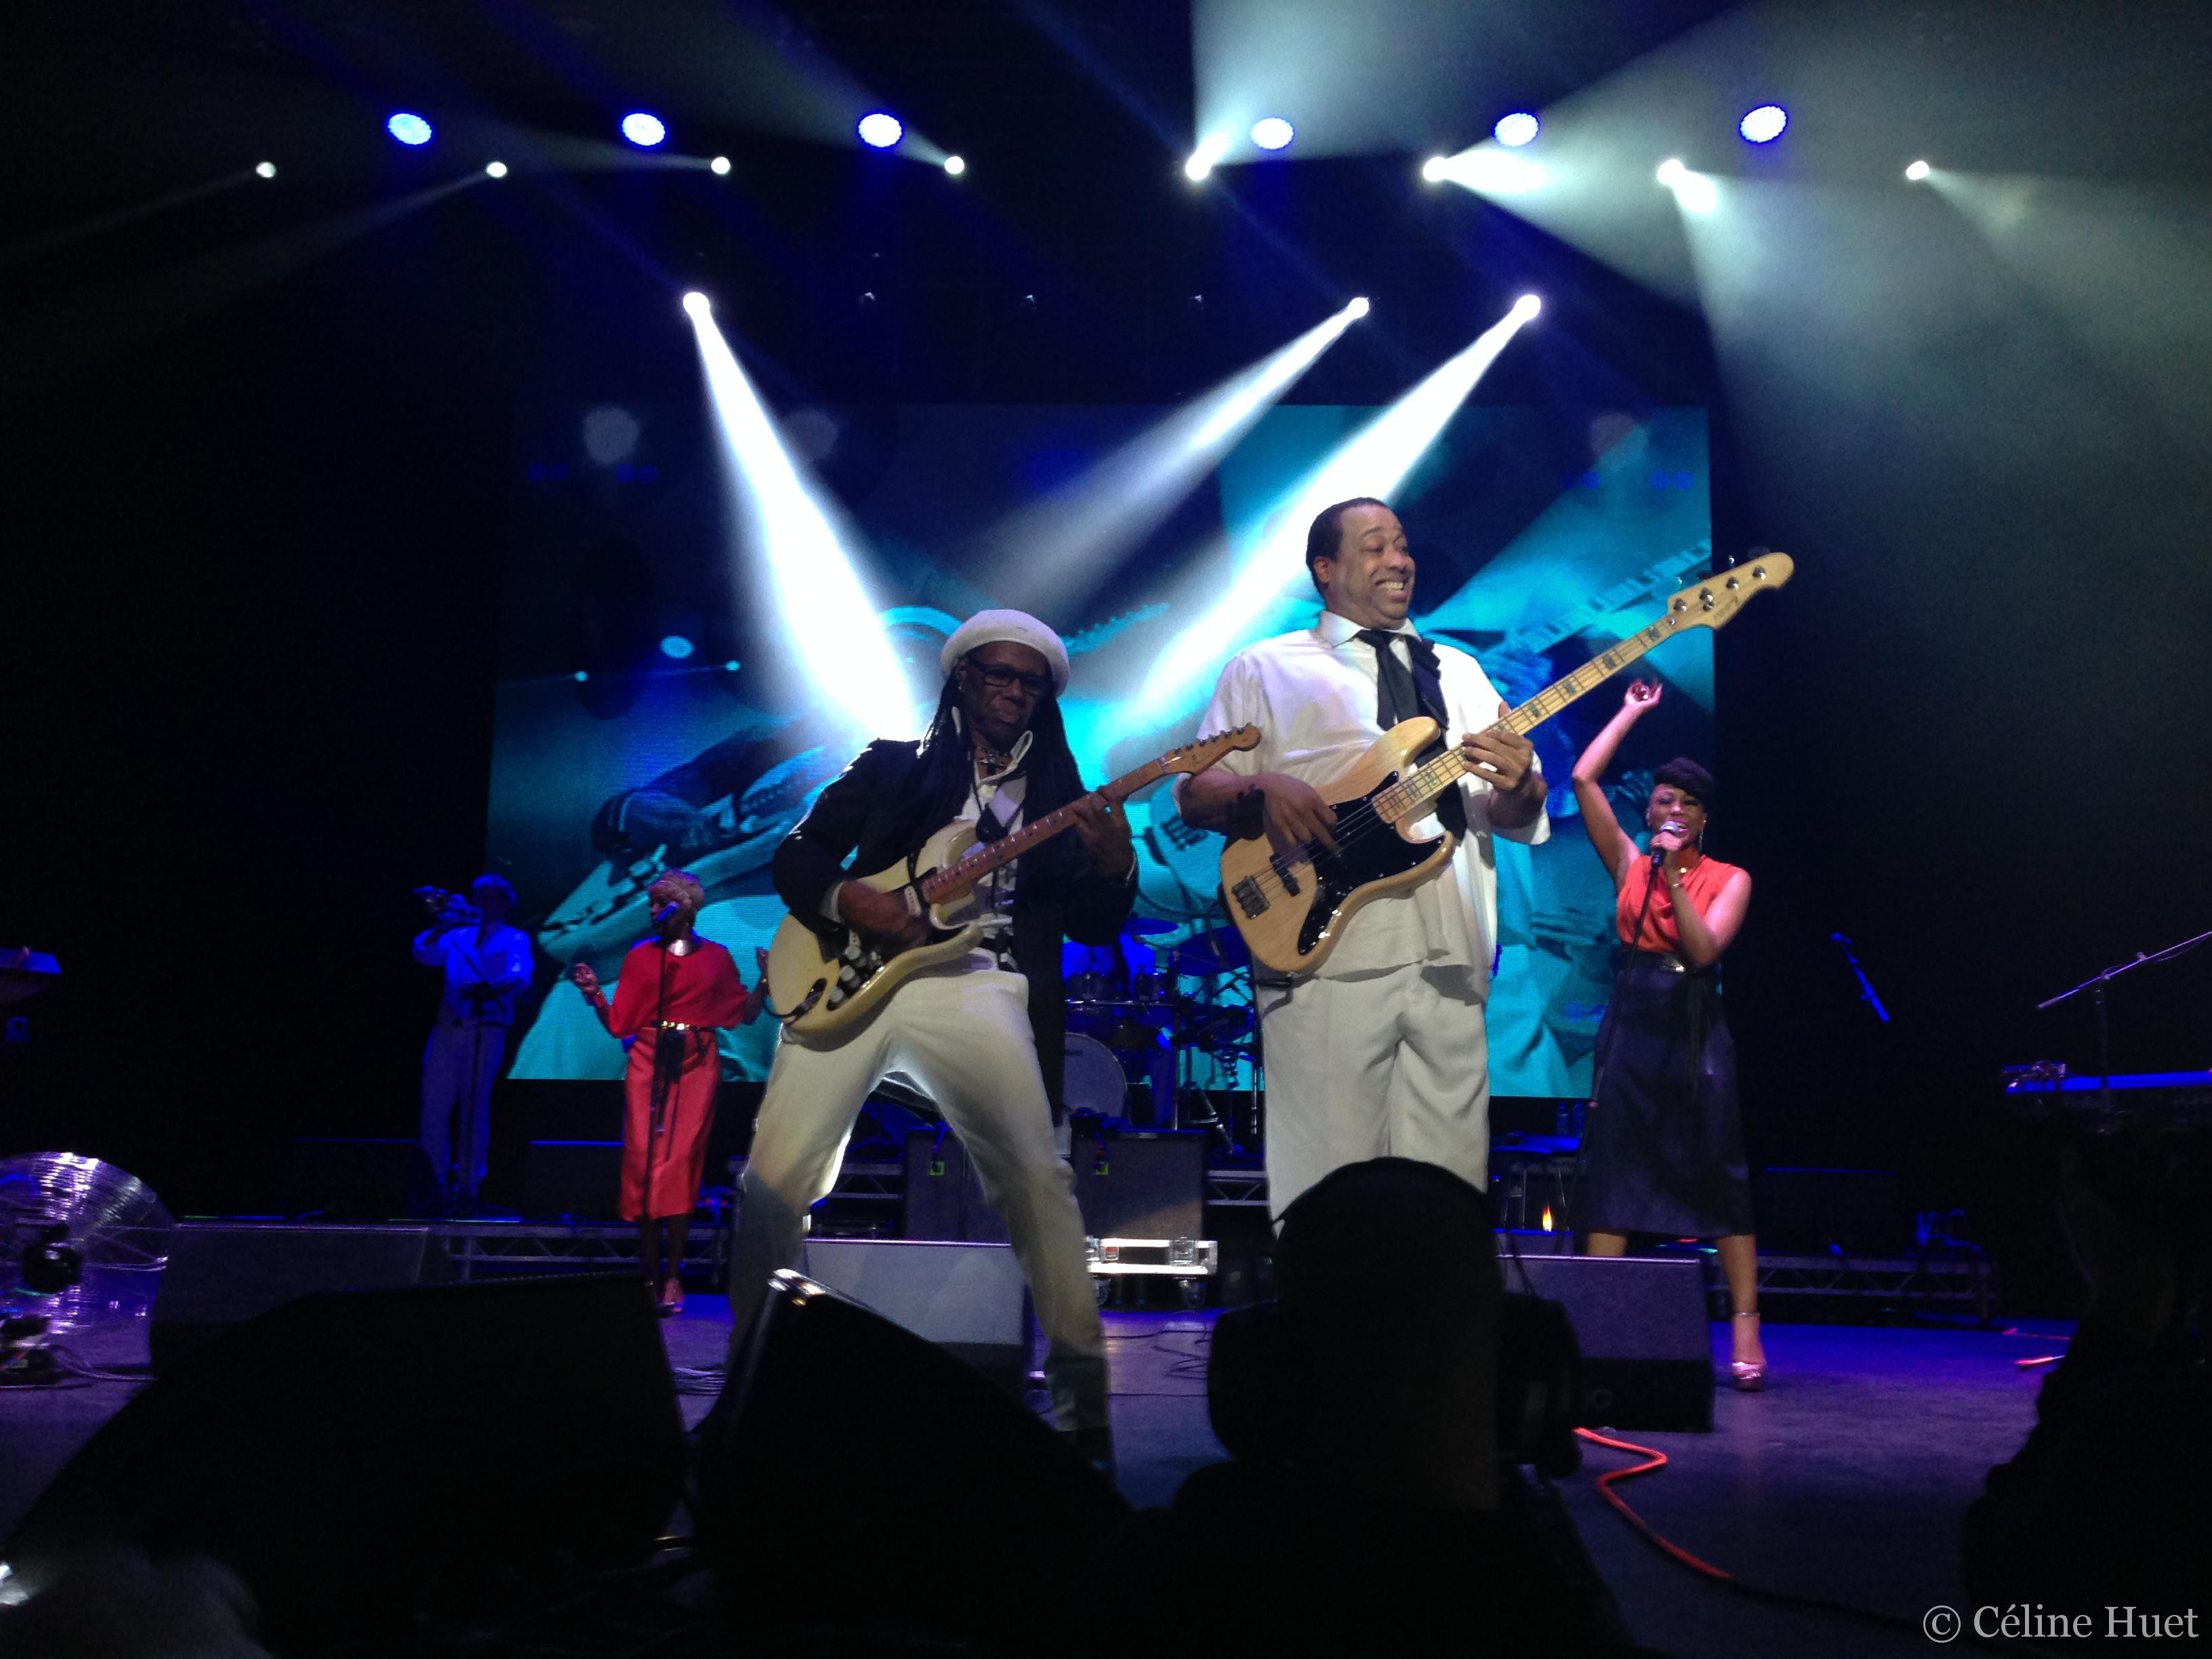 Concert Chic Nile Rodgers O2 Apollo Manchester Royaume Uni